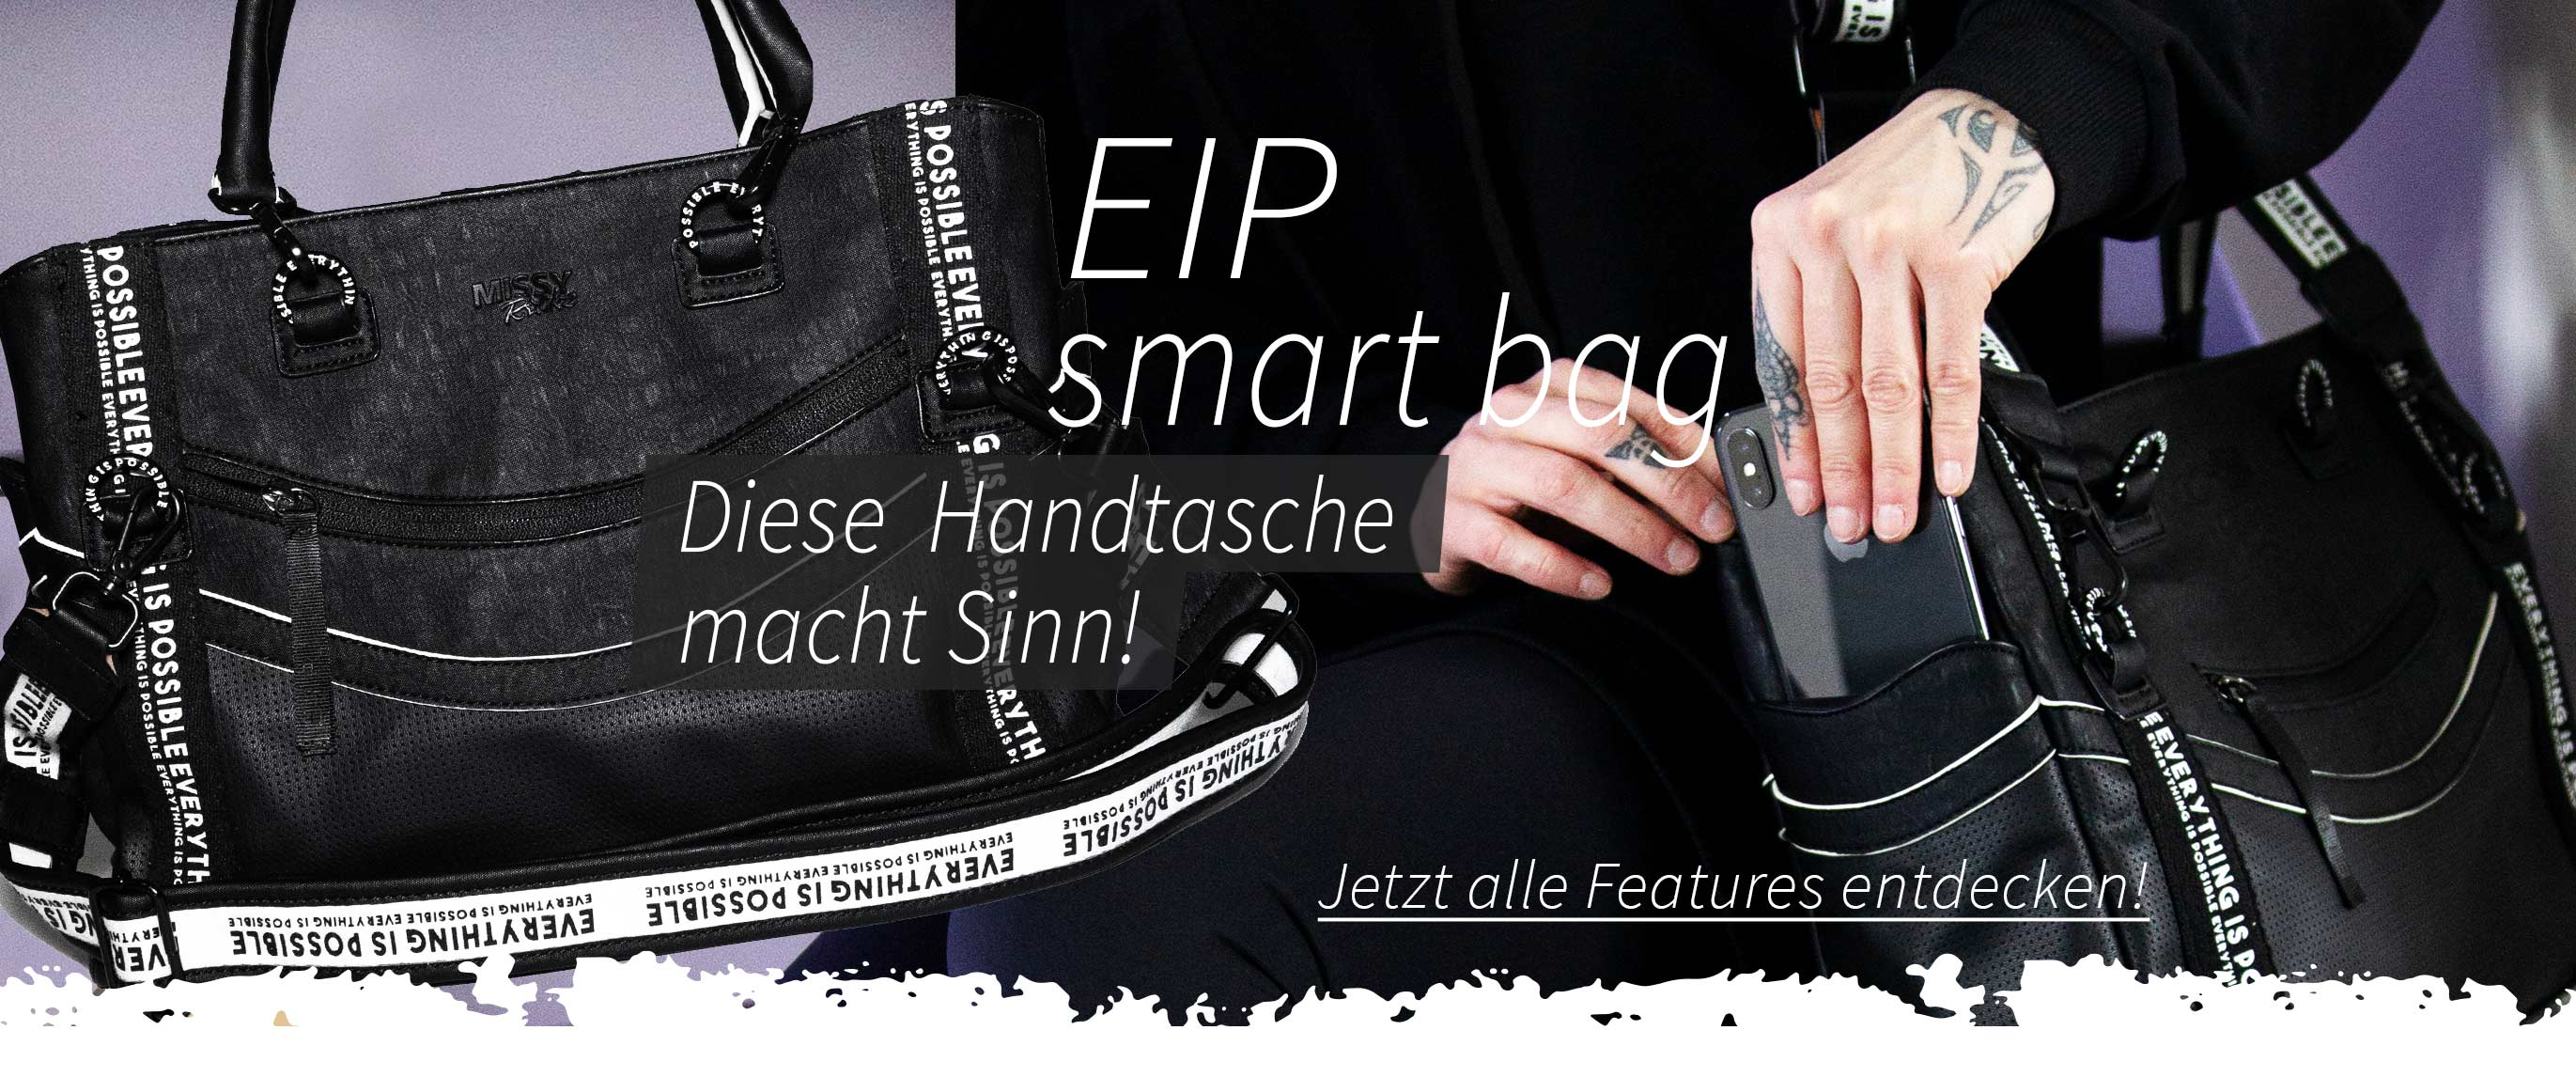 EIP smart bag